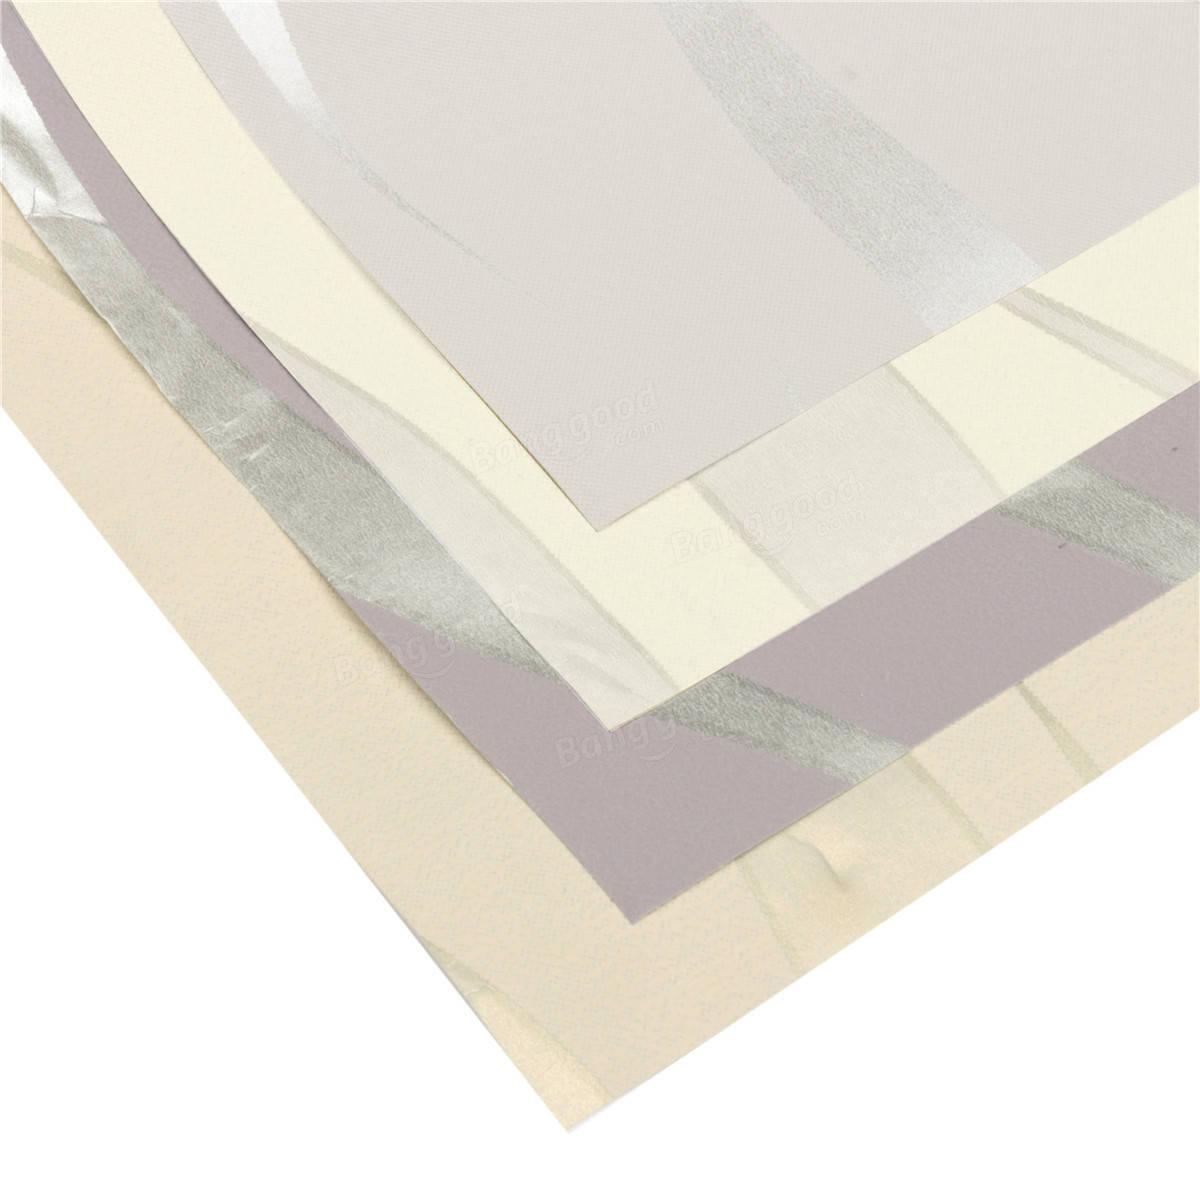 3d Wave Flocking Wallpaper 10m 3d Mezzaluna Onda Strisce Non Tessuto Affollando